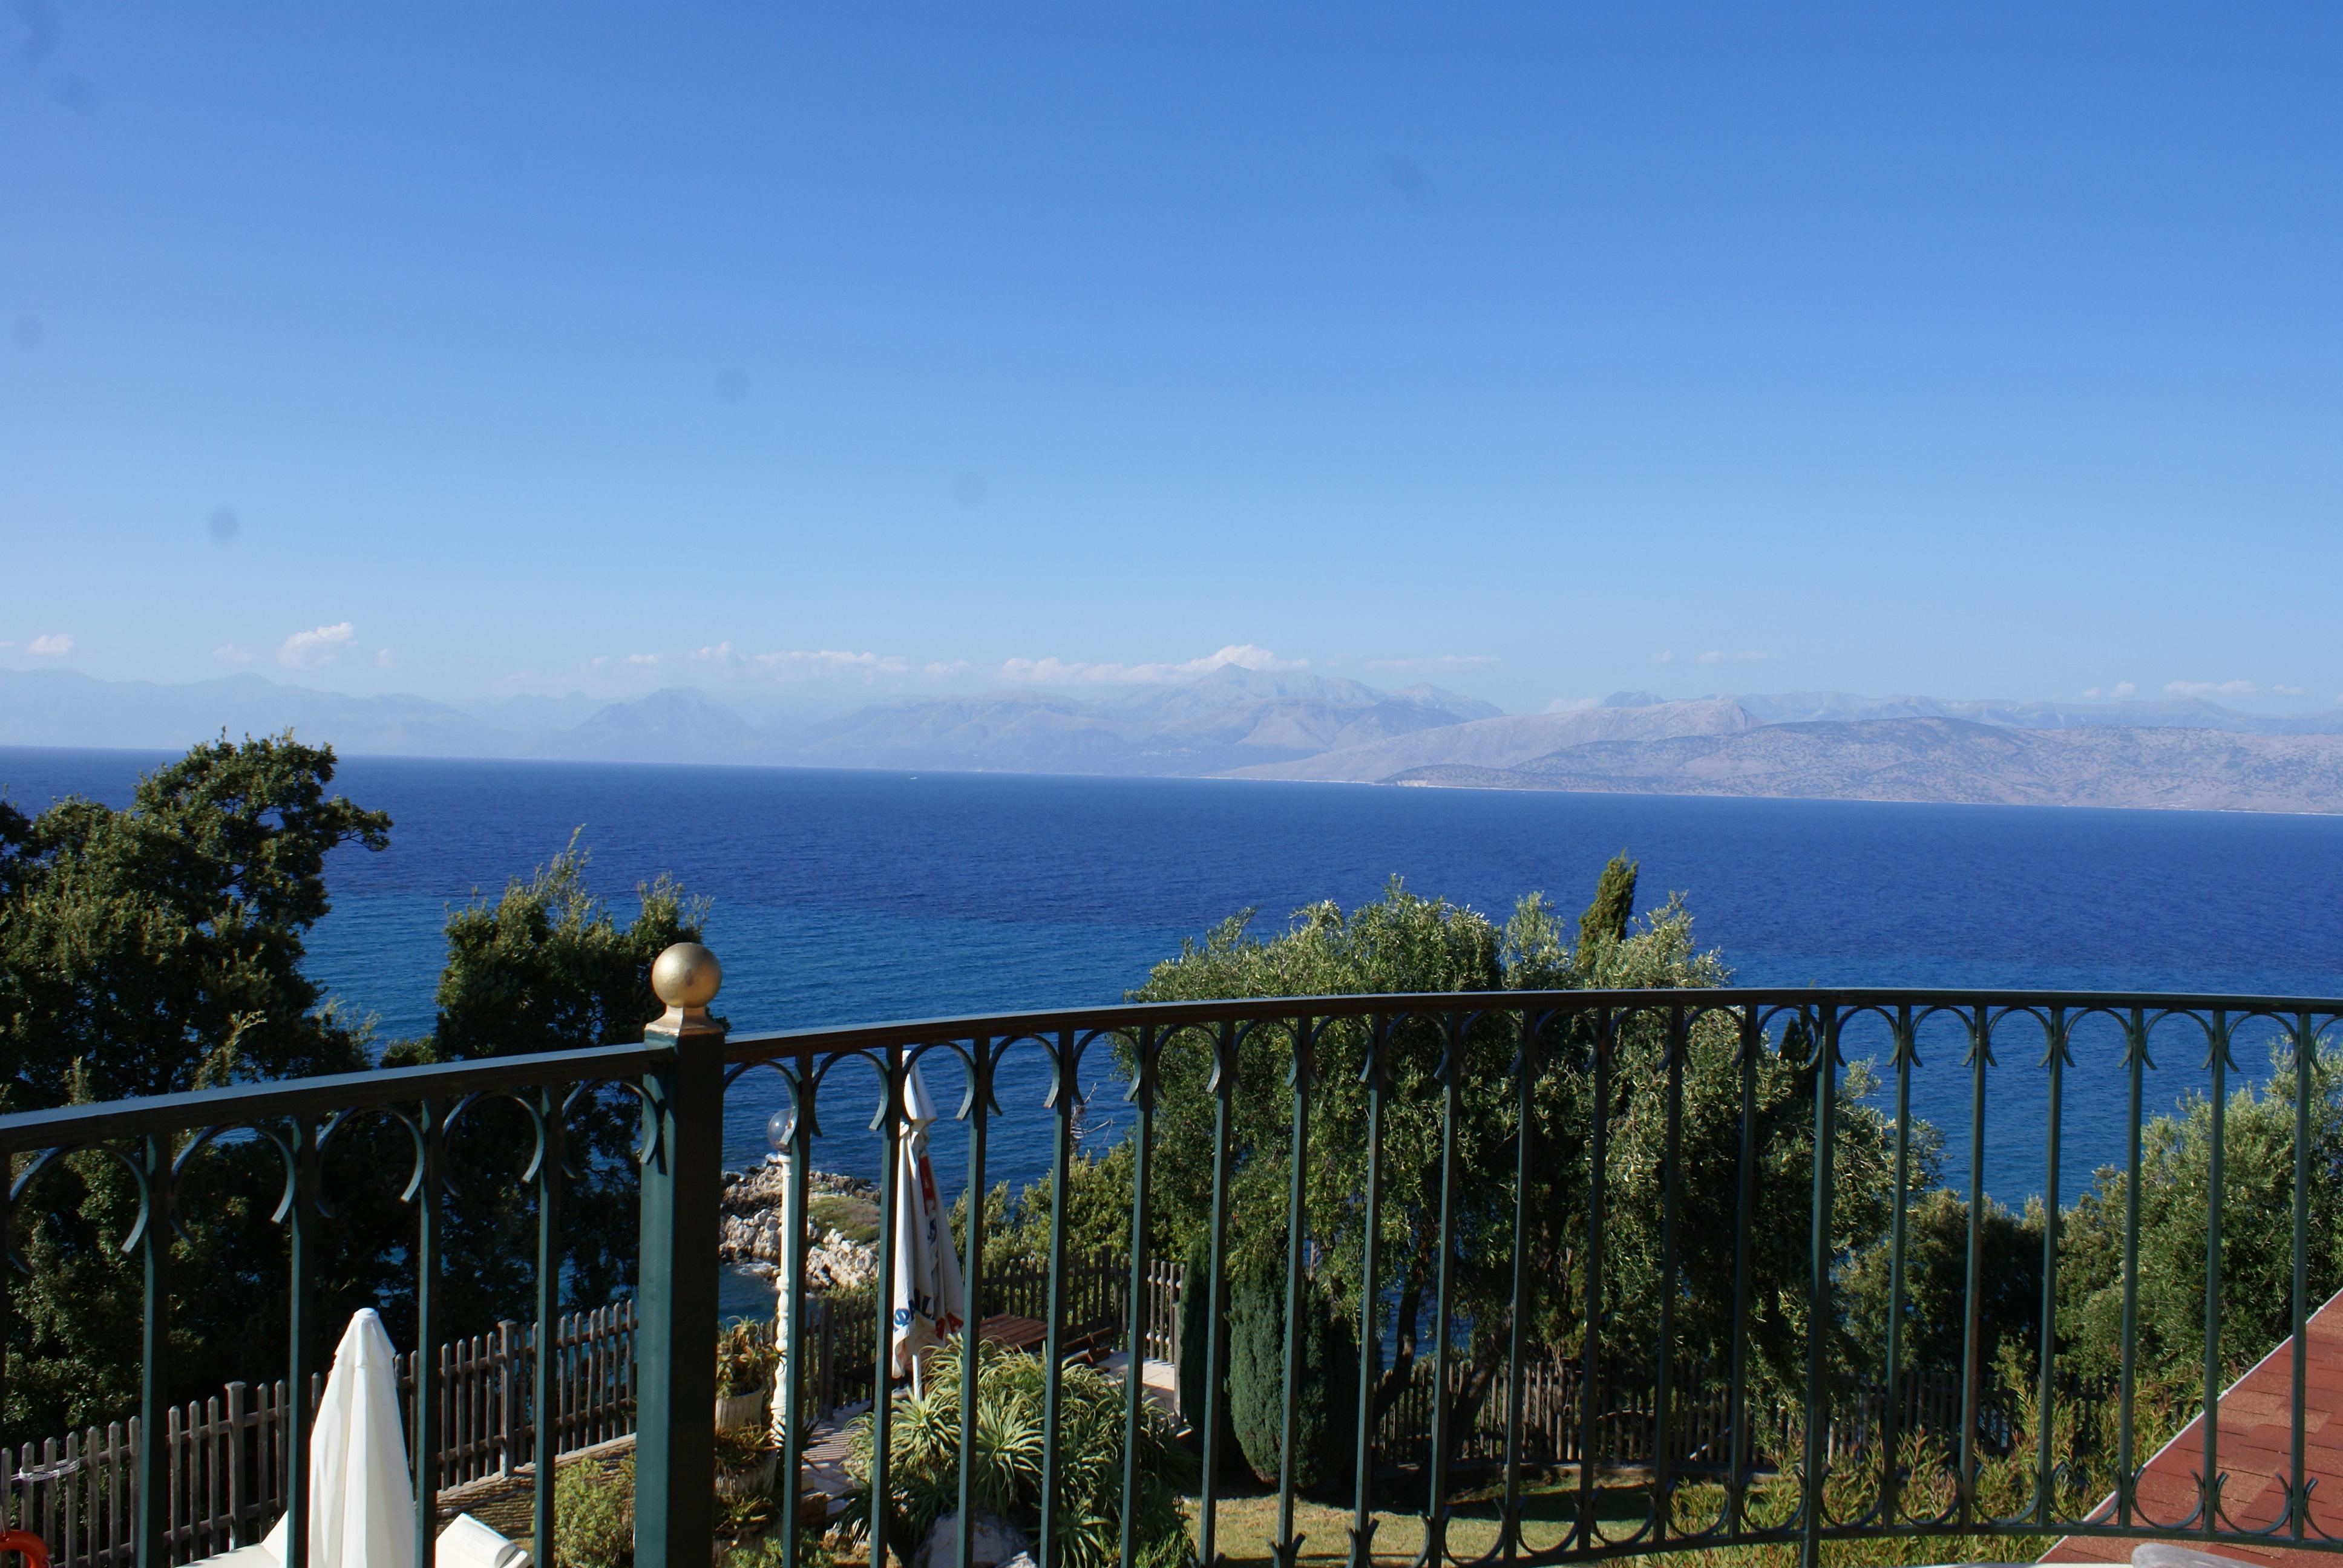 Blick nach Albanien - Korfu Villa Sankt Nikolas Strandhaus, Agios Spiridon, KorfuCorfu